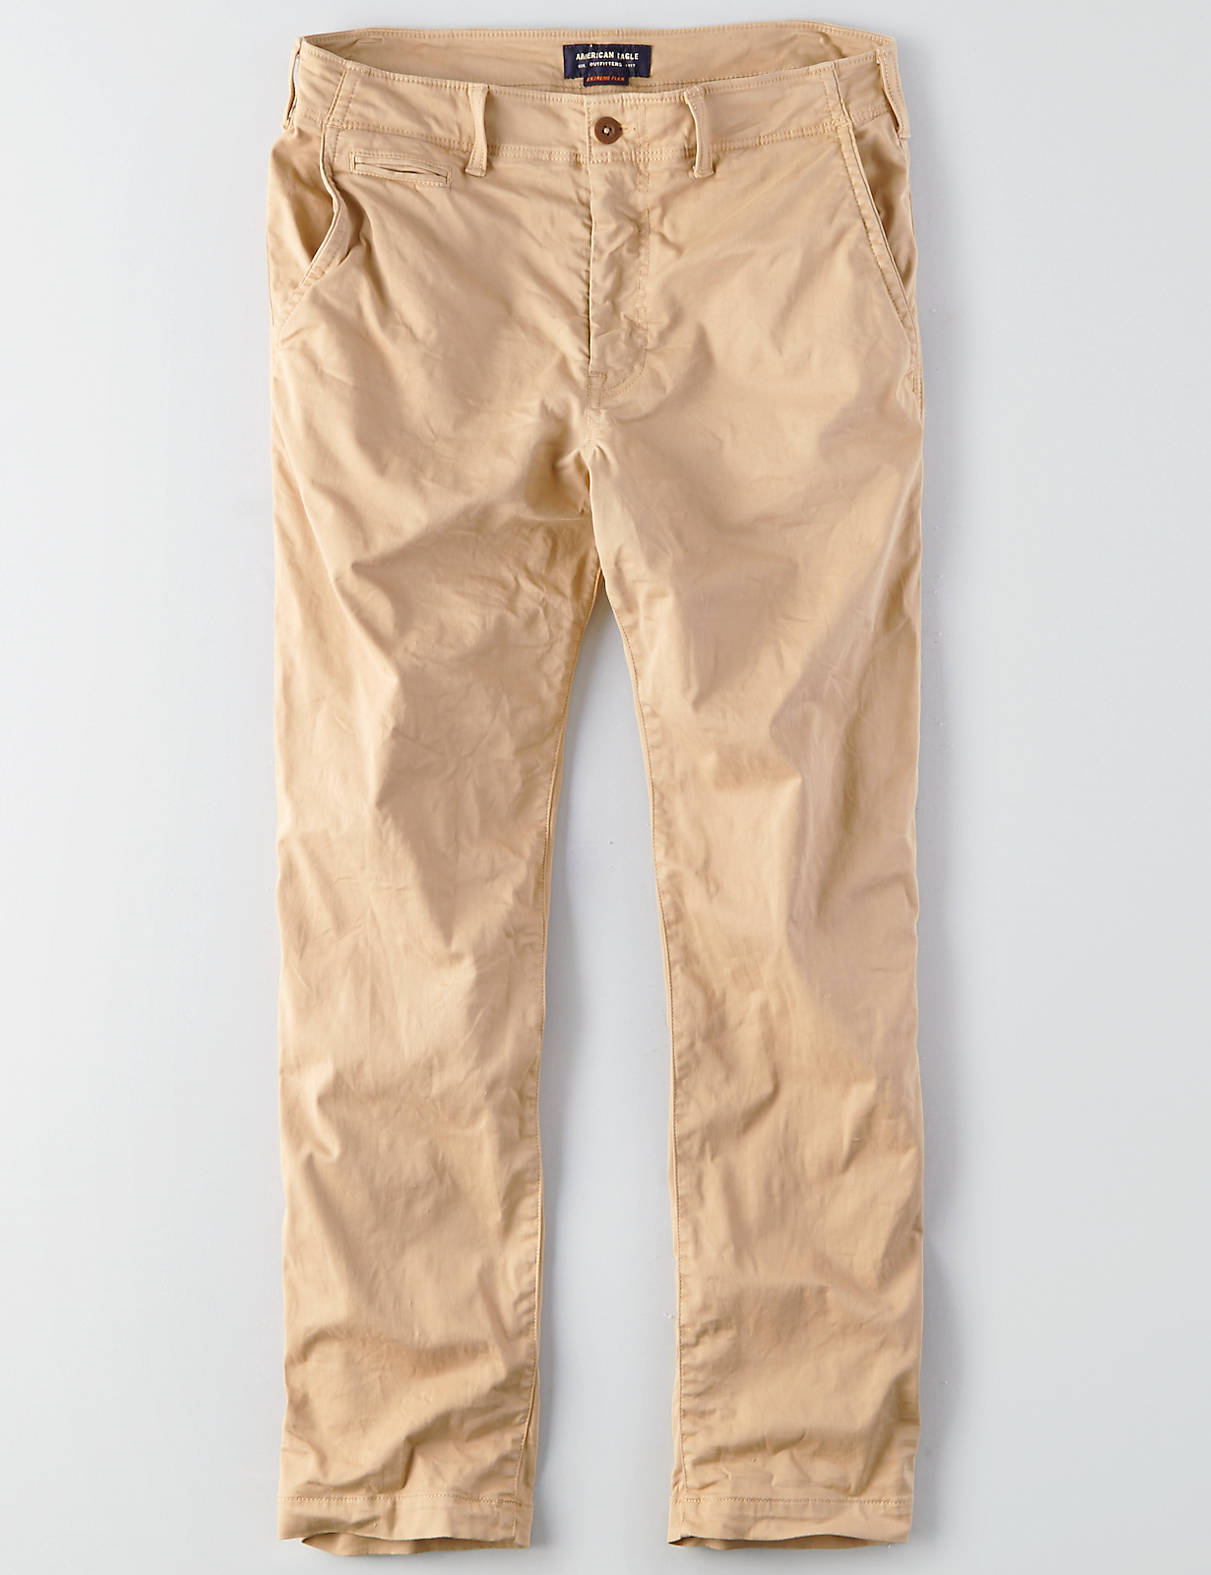 khaki jeans khakis u0026 pants for men | american eagle outfitters YYWWISD